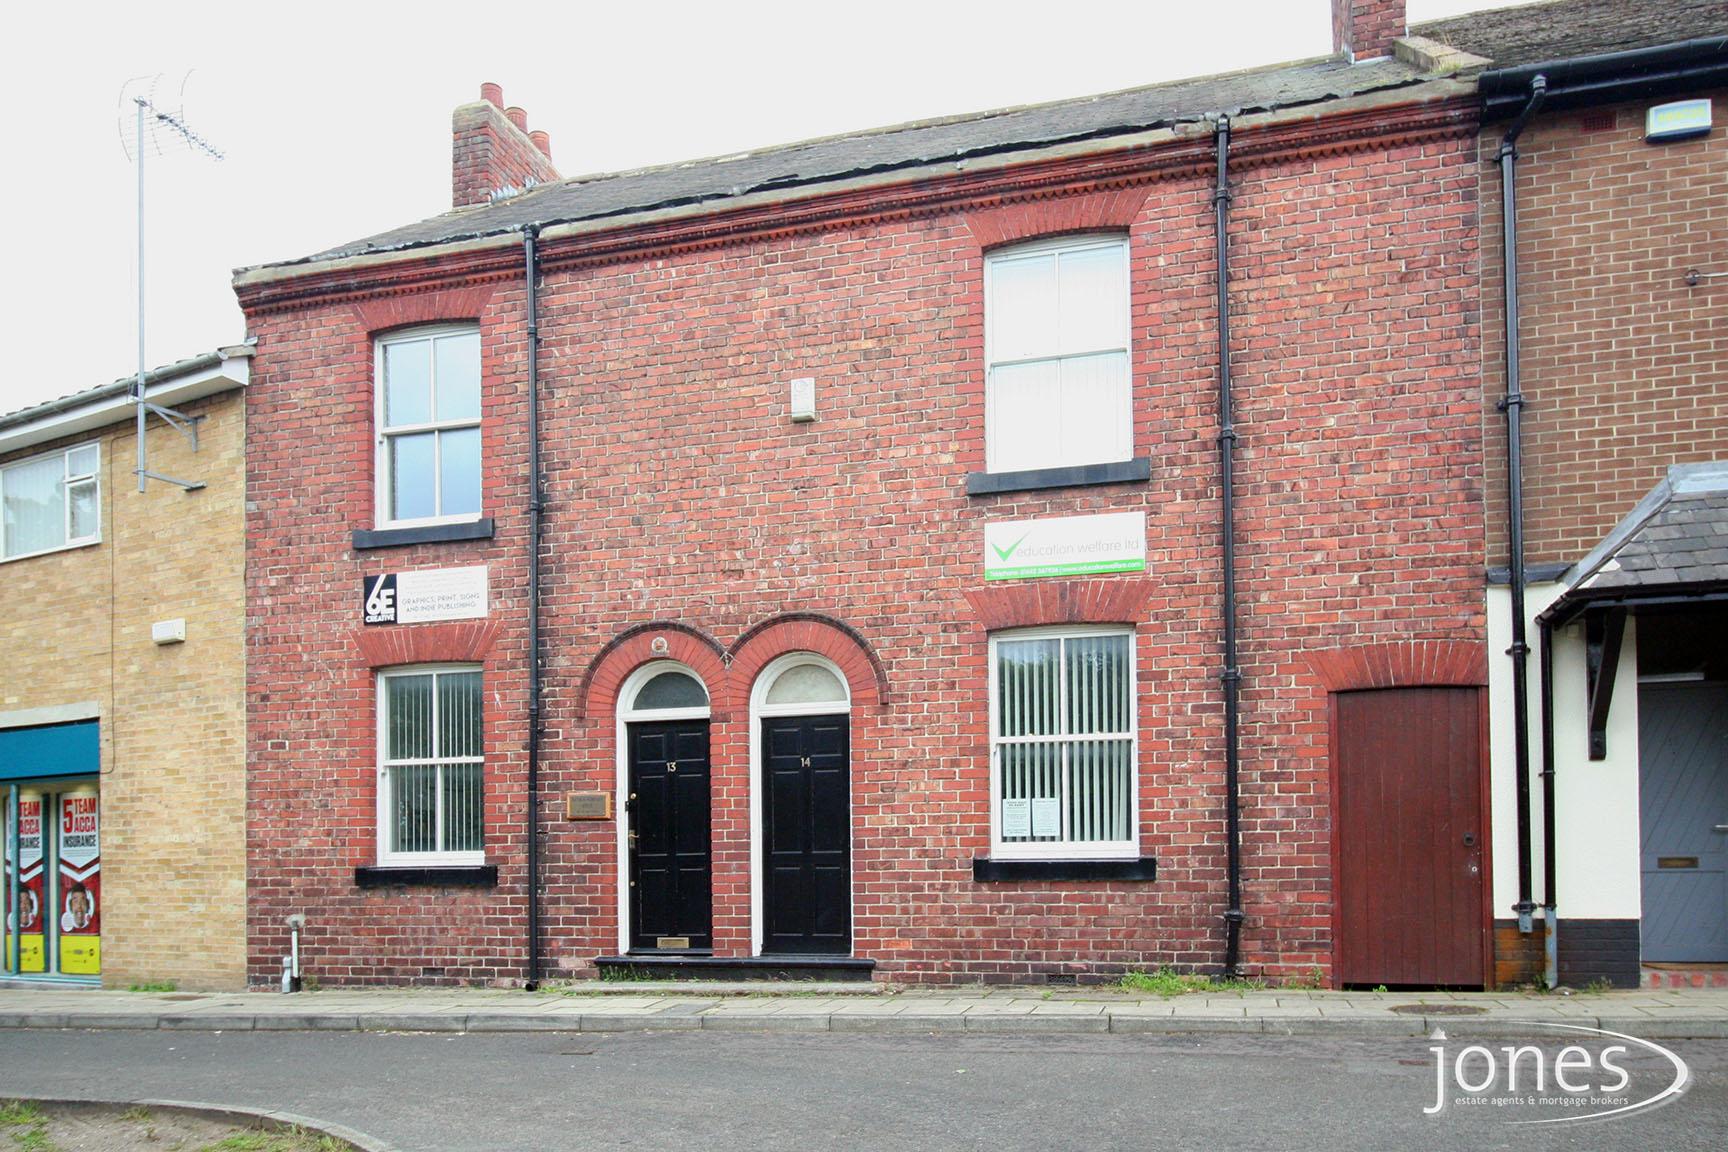 Home for Sale Let - Photo 01 The Green (Suite 1), Billingham, TS23 1EU